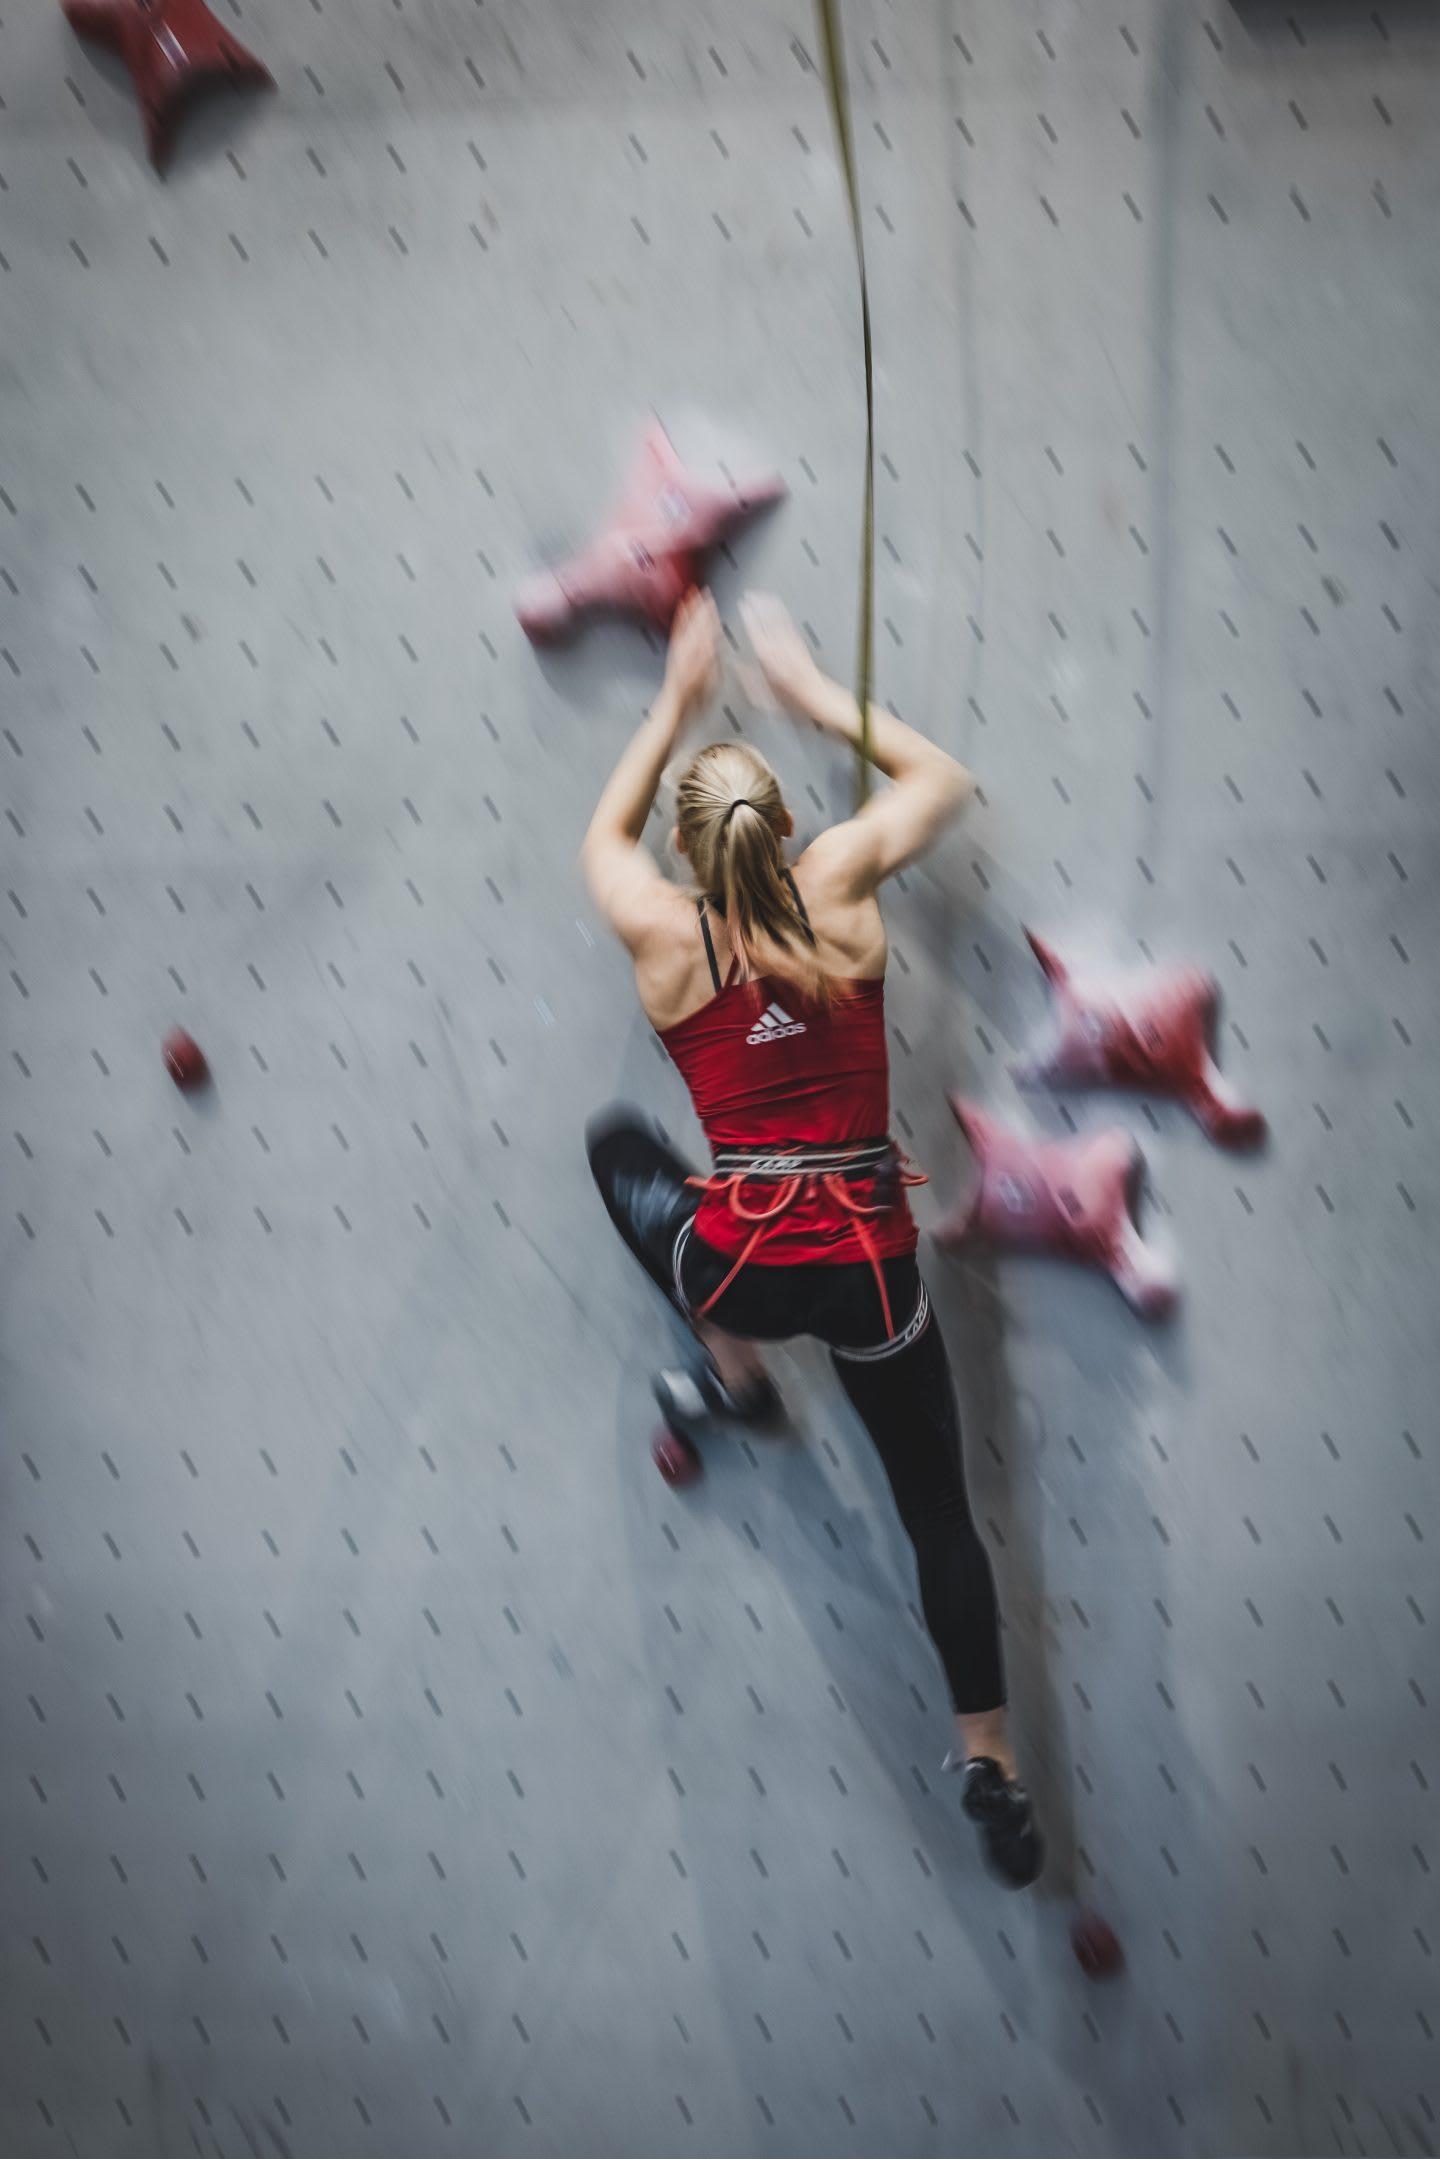 Janja Garnbret climbing indoor on a grey wall. Janja Garnbret, climbing, indoor, mindset, speed climbing